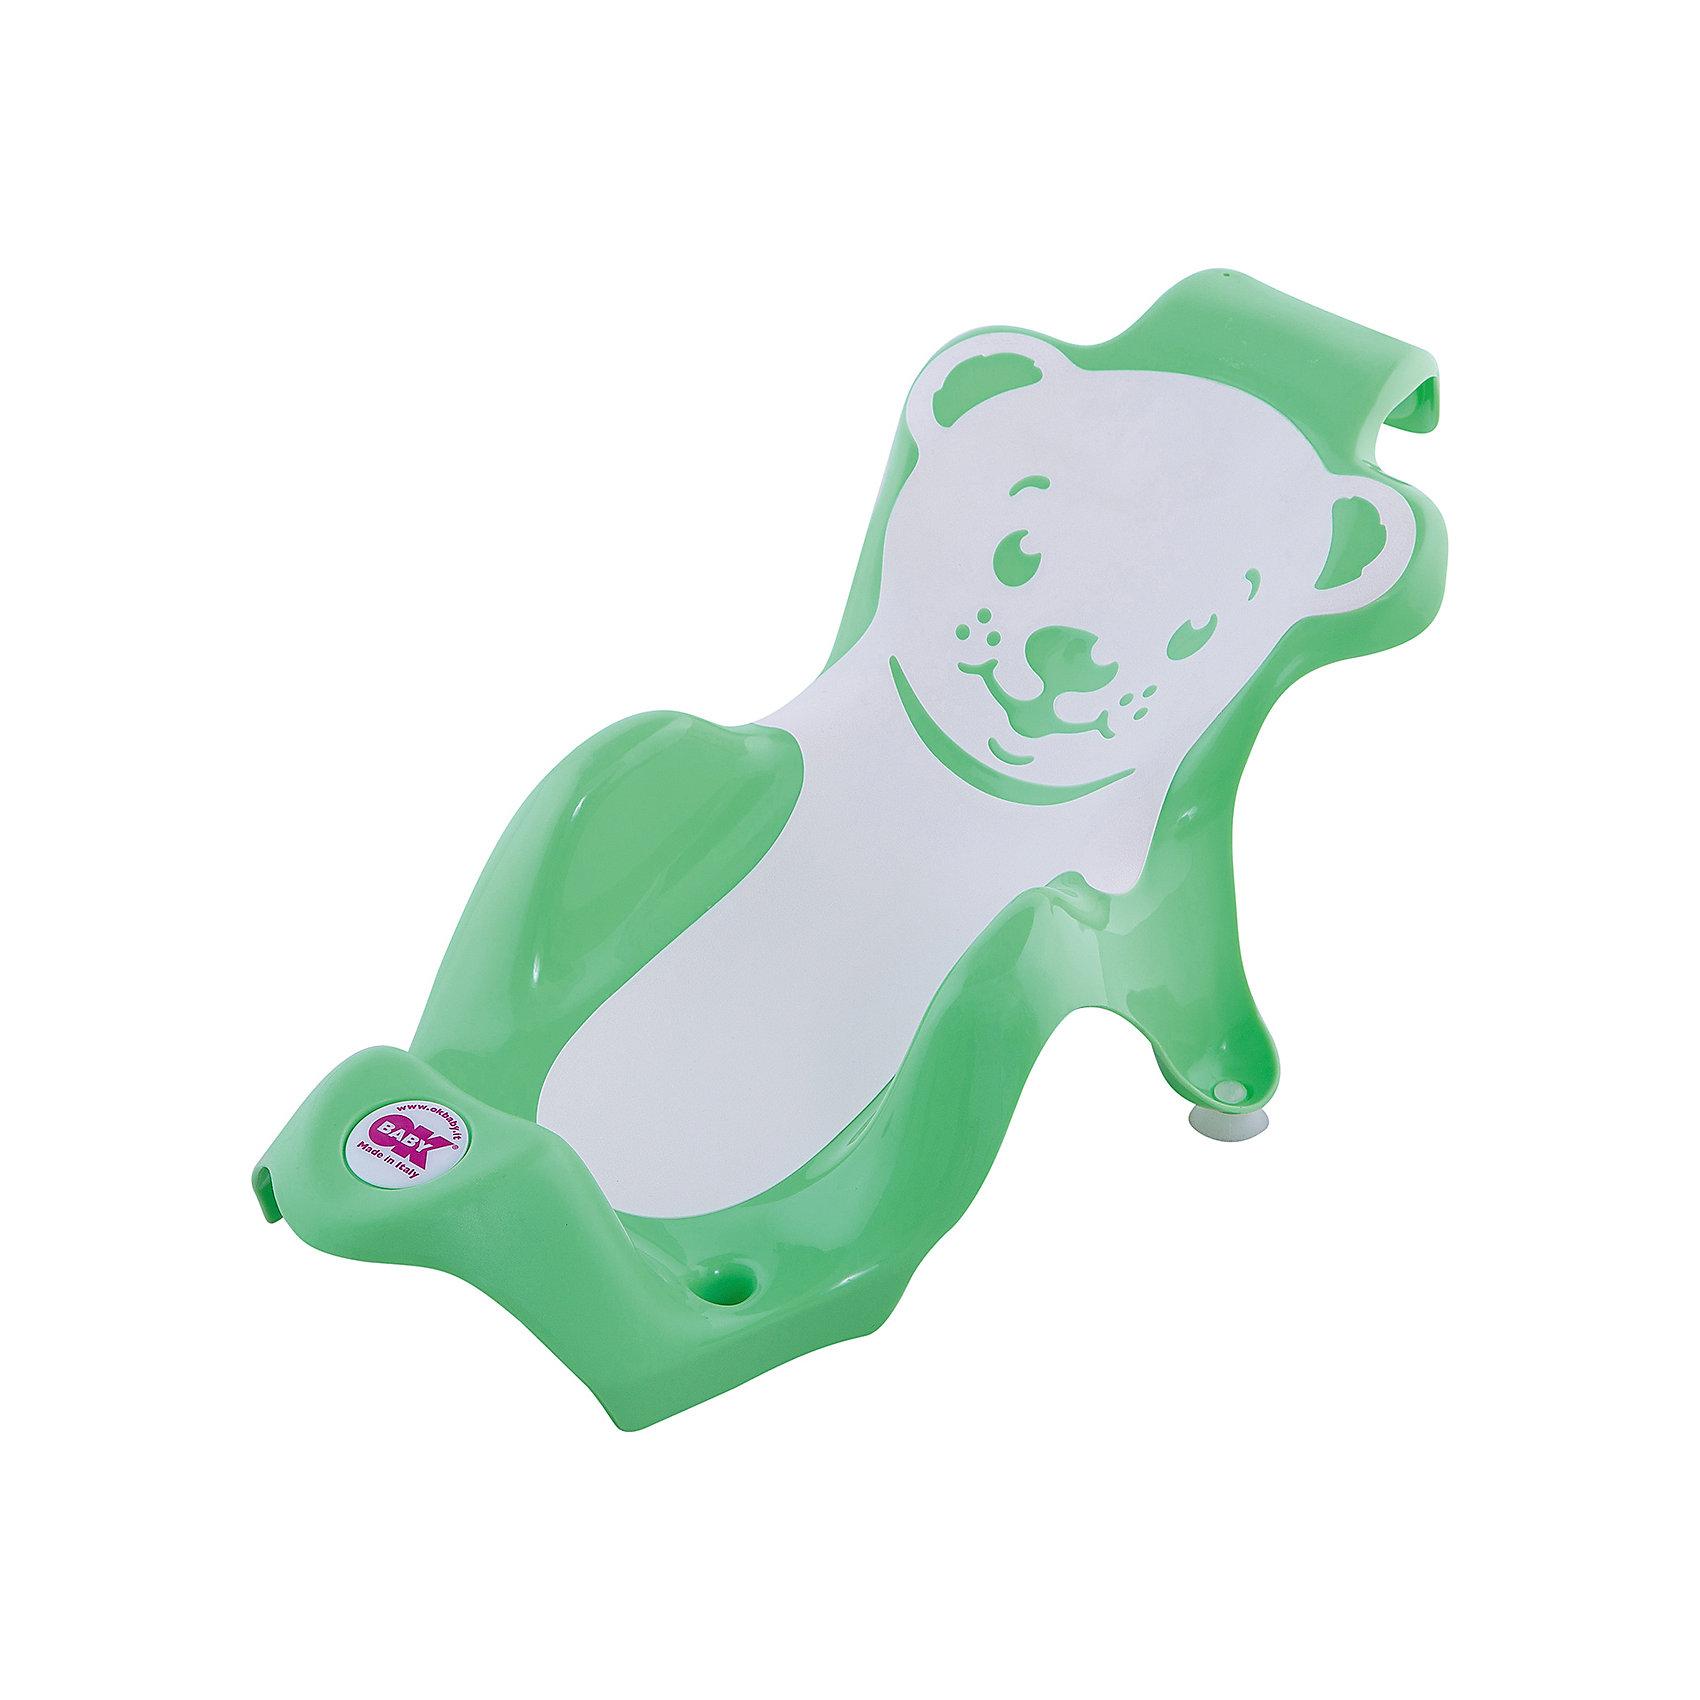 Горка для купания Buddy, Ok Baby, зеленый (OK Baby)